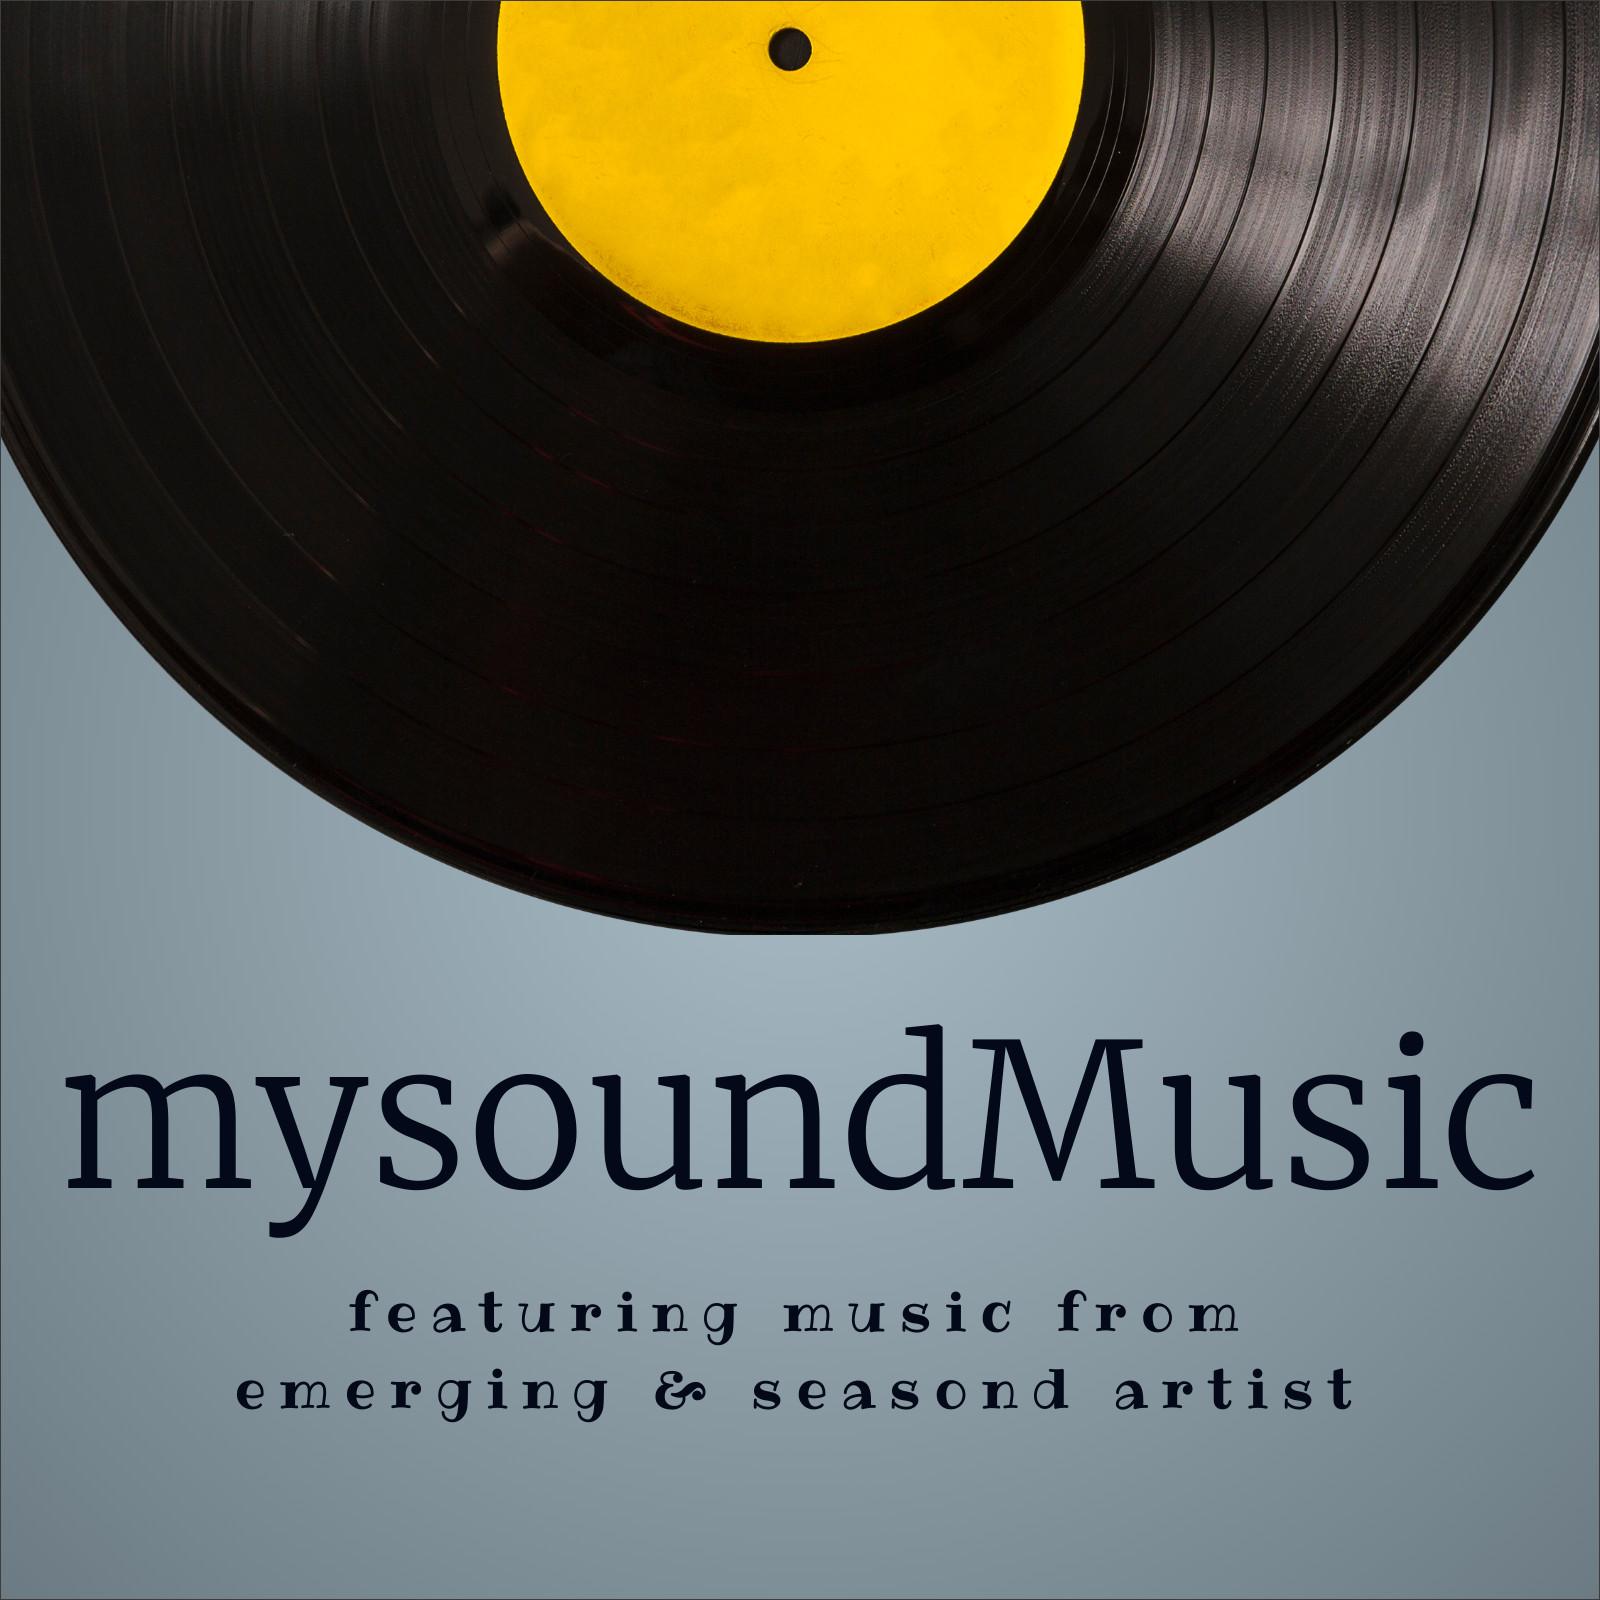 mysoundmusicspotifylogo_grey7.jpg